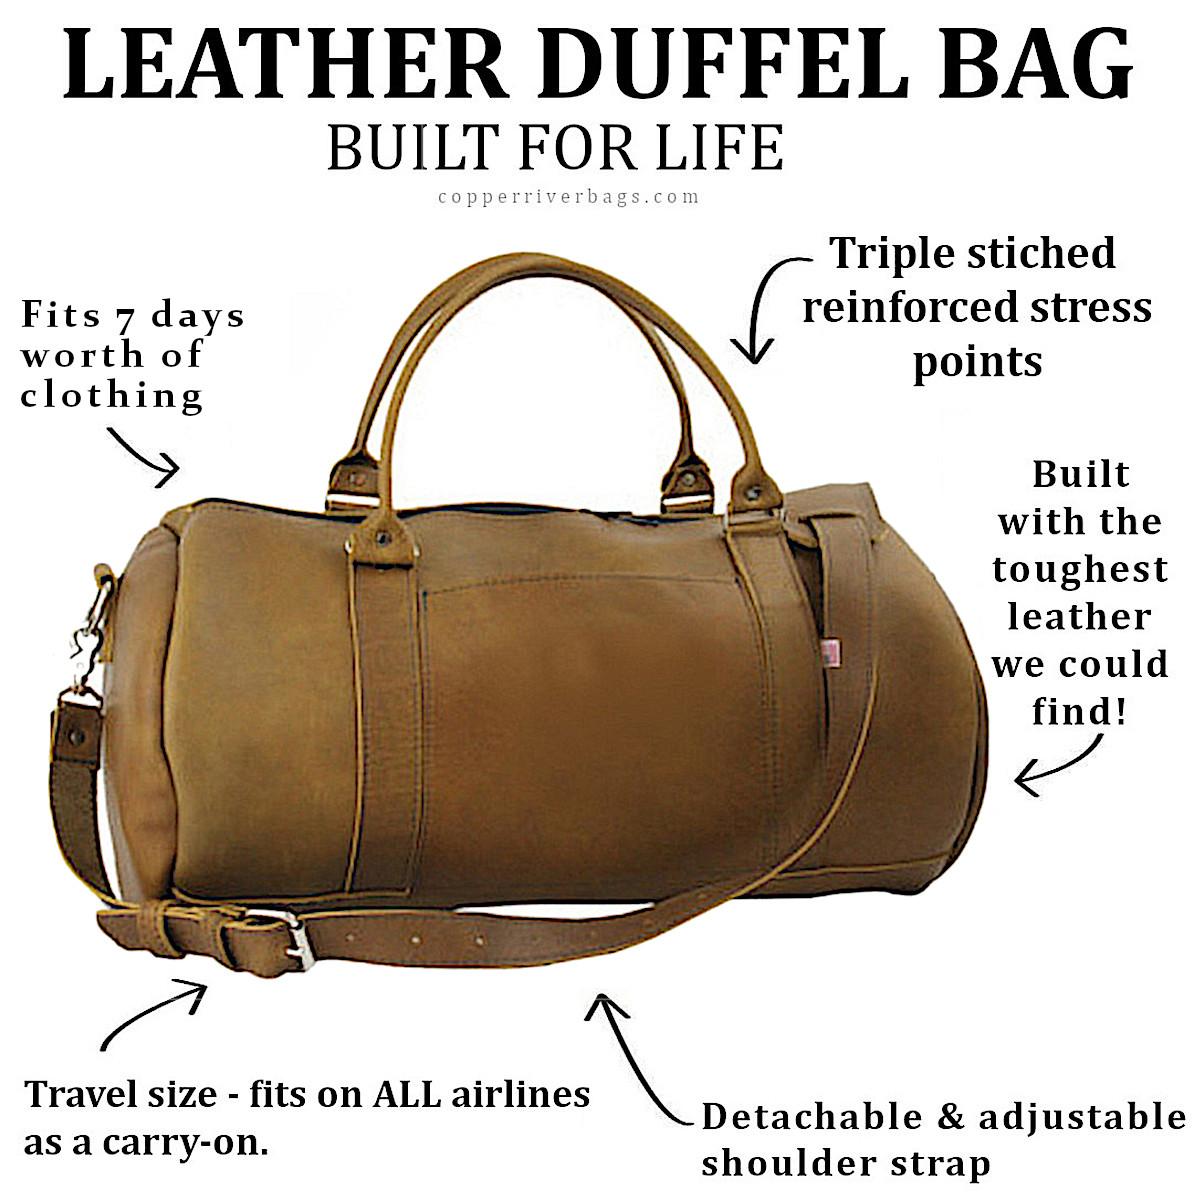 copper-river-duffel-bag-google-disply-ad-logo-1200-x-1200-098976954.jpg